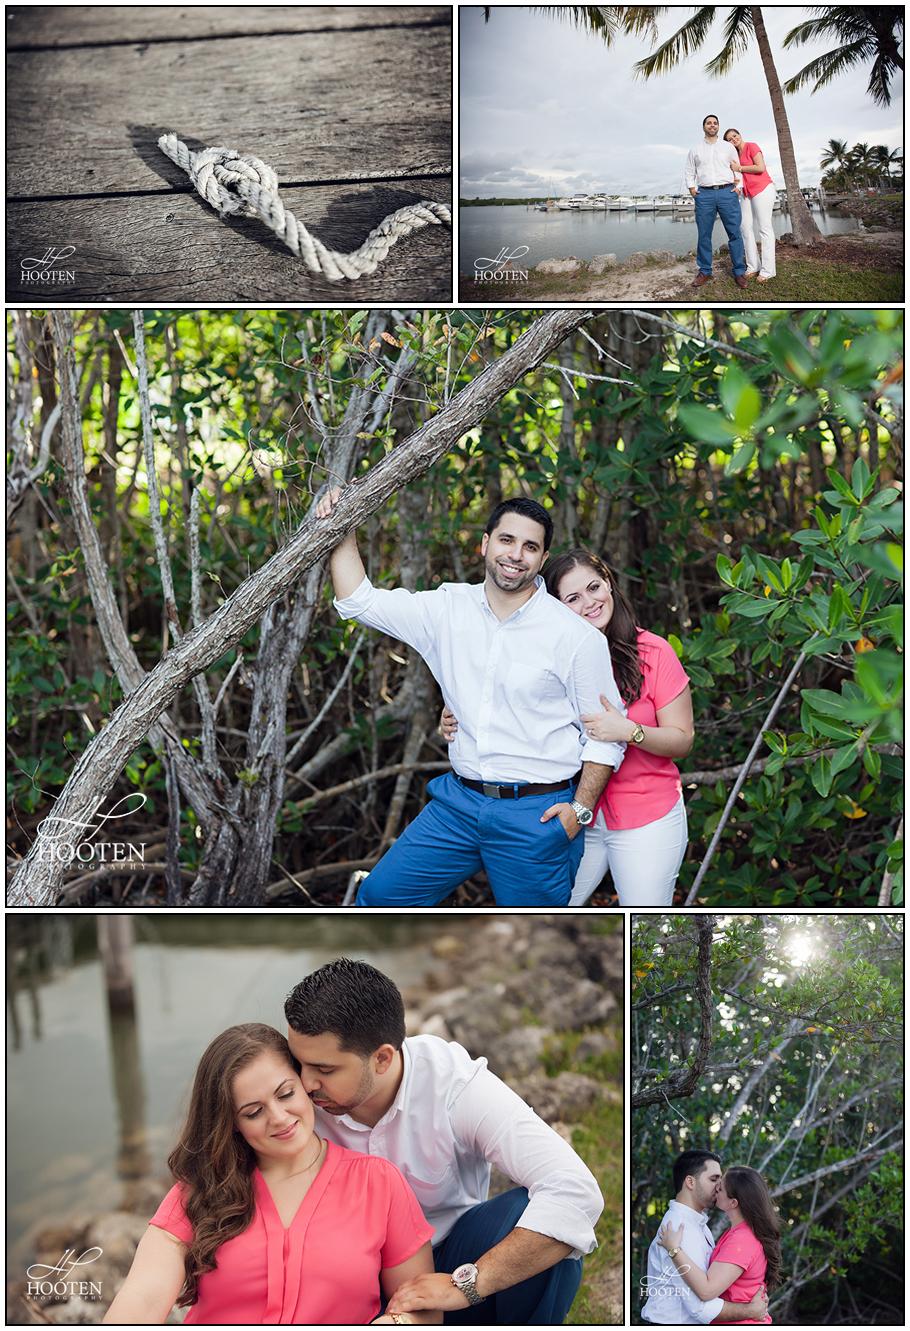 Miami-Wedding-Photography-Marina-Engagement-Session-Melvin-Kristina-Photo.jpg